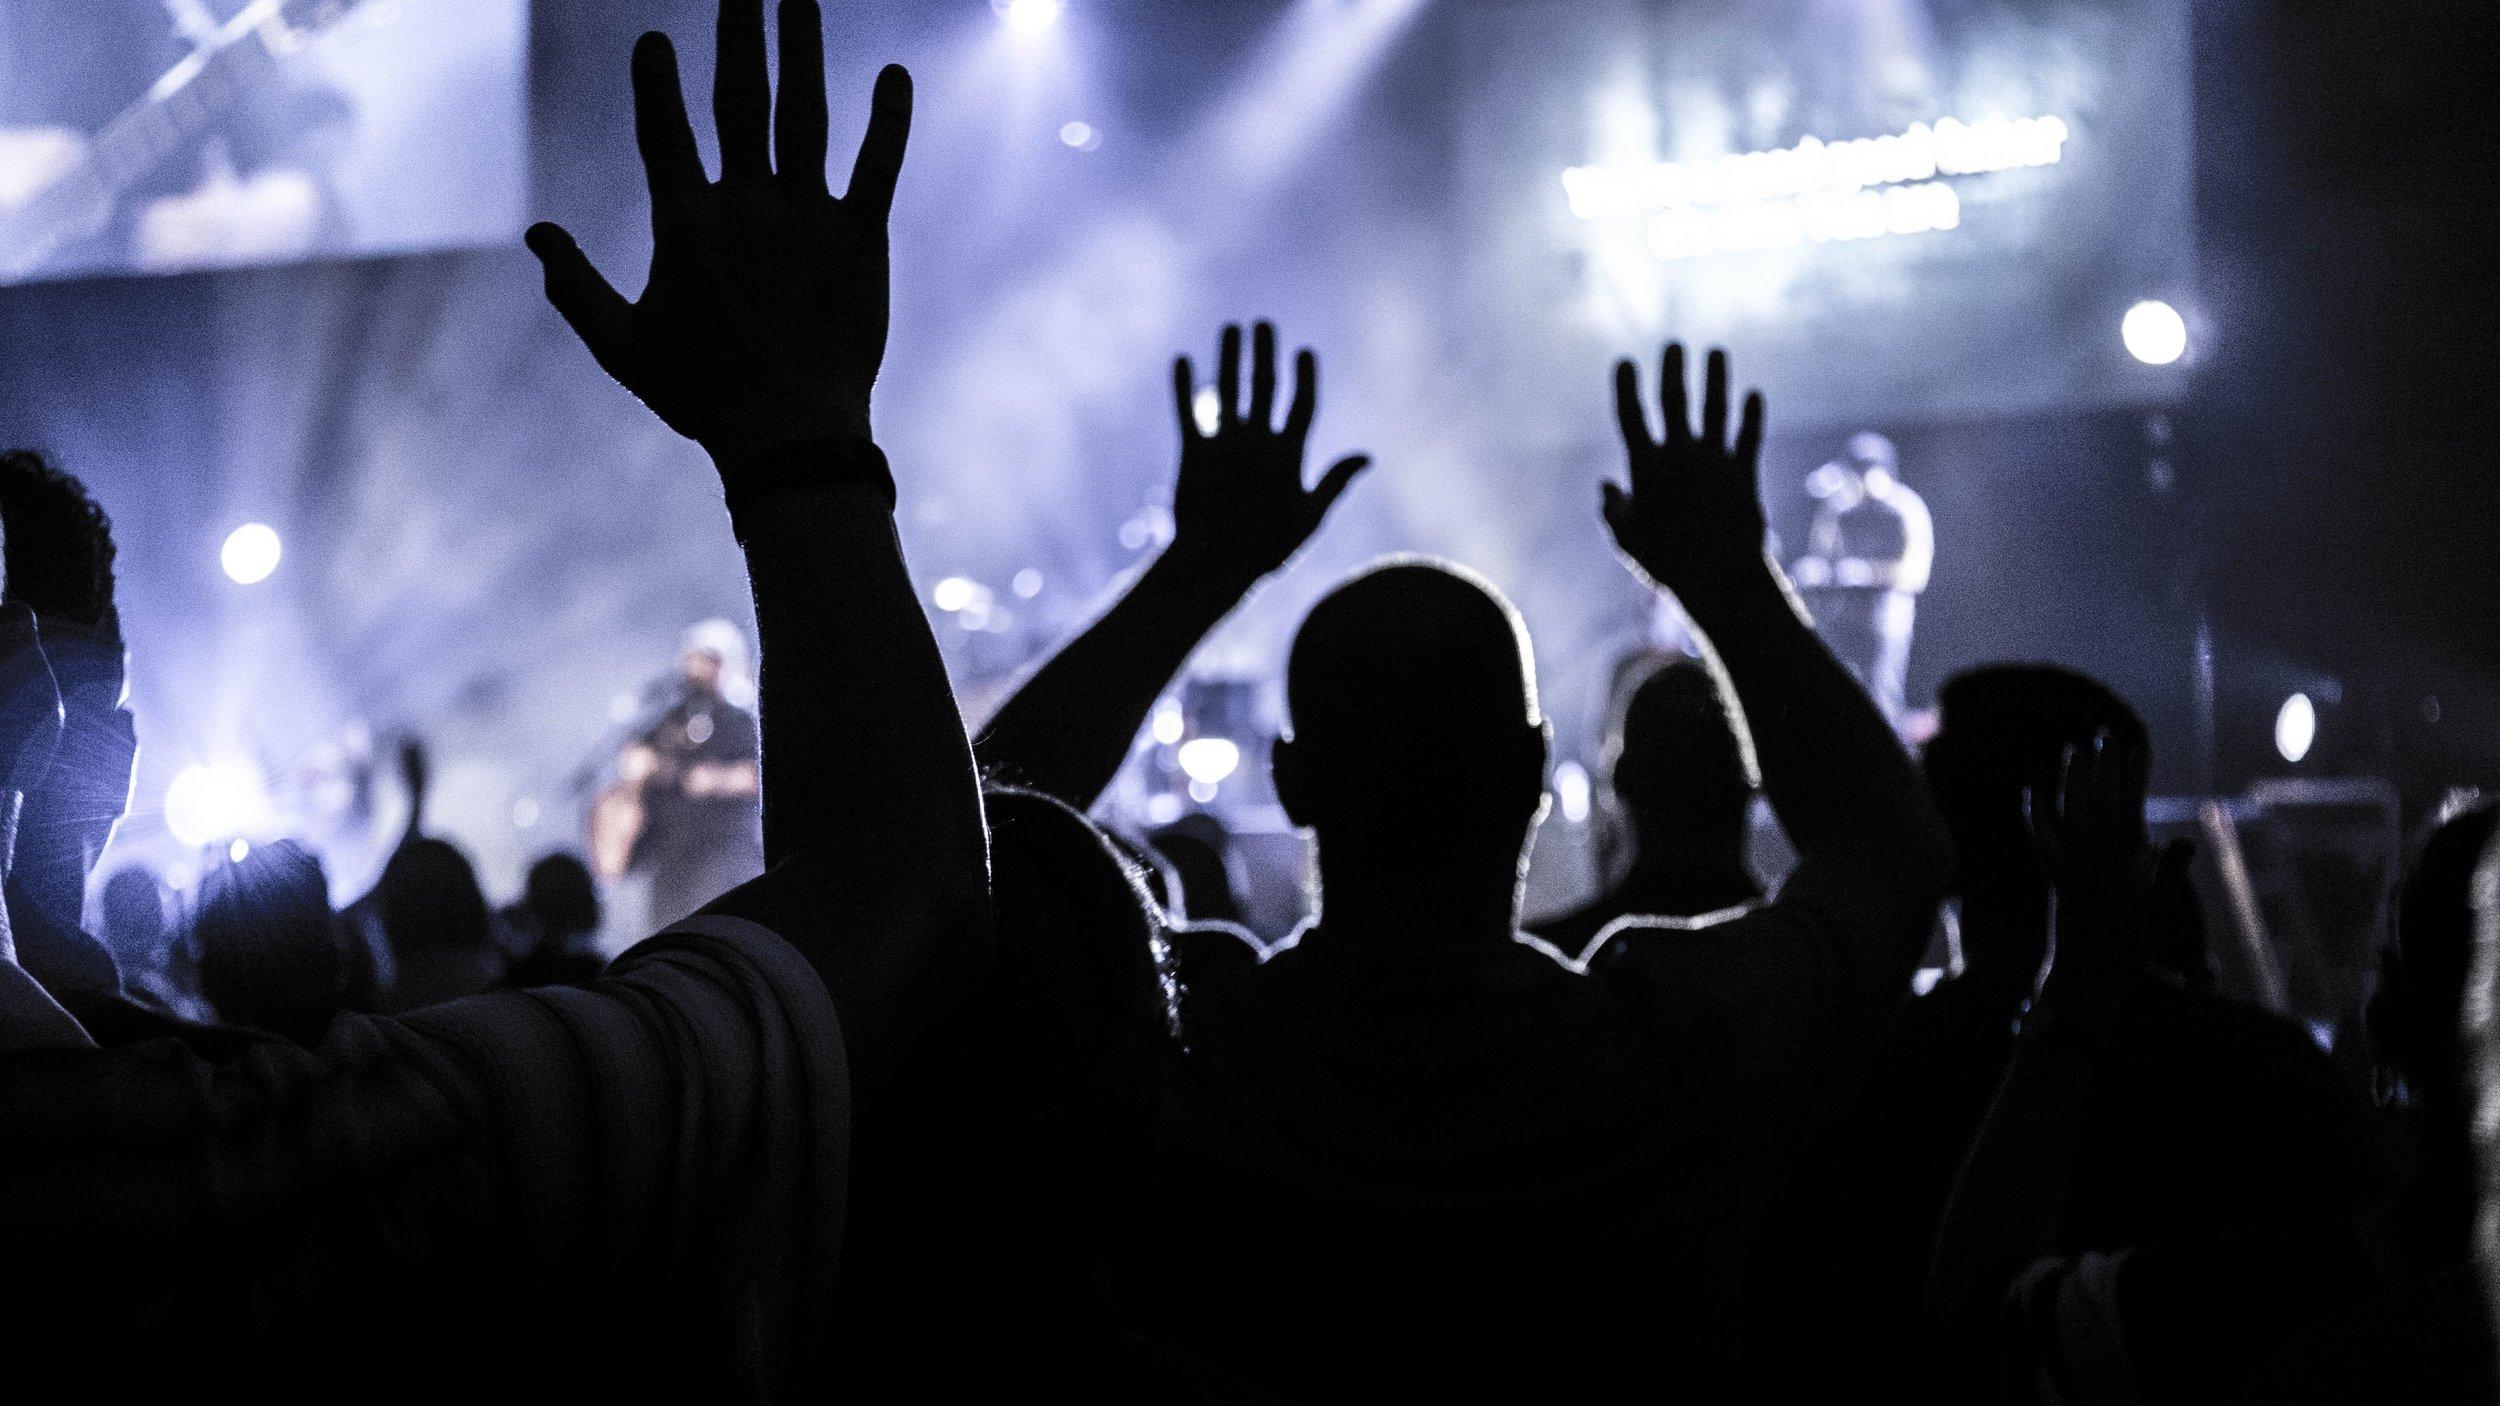 adult-applause-audience-952437.jpg